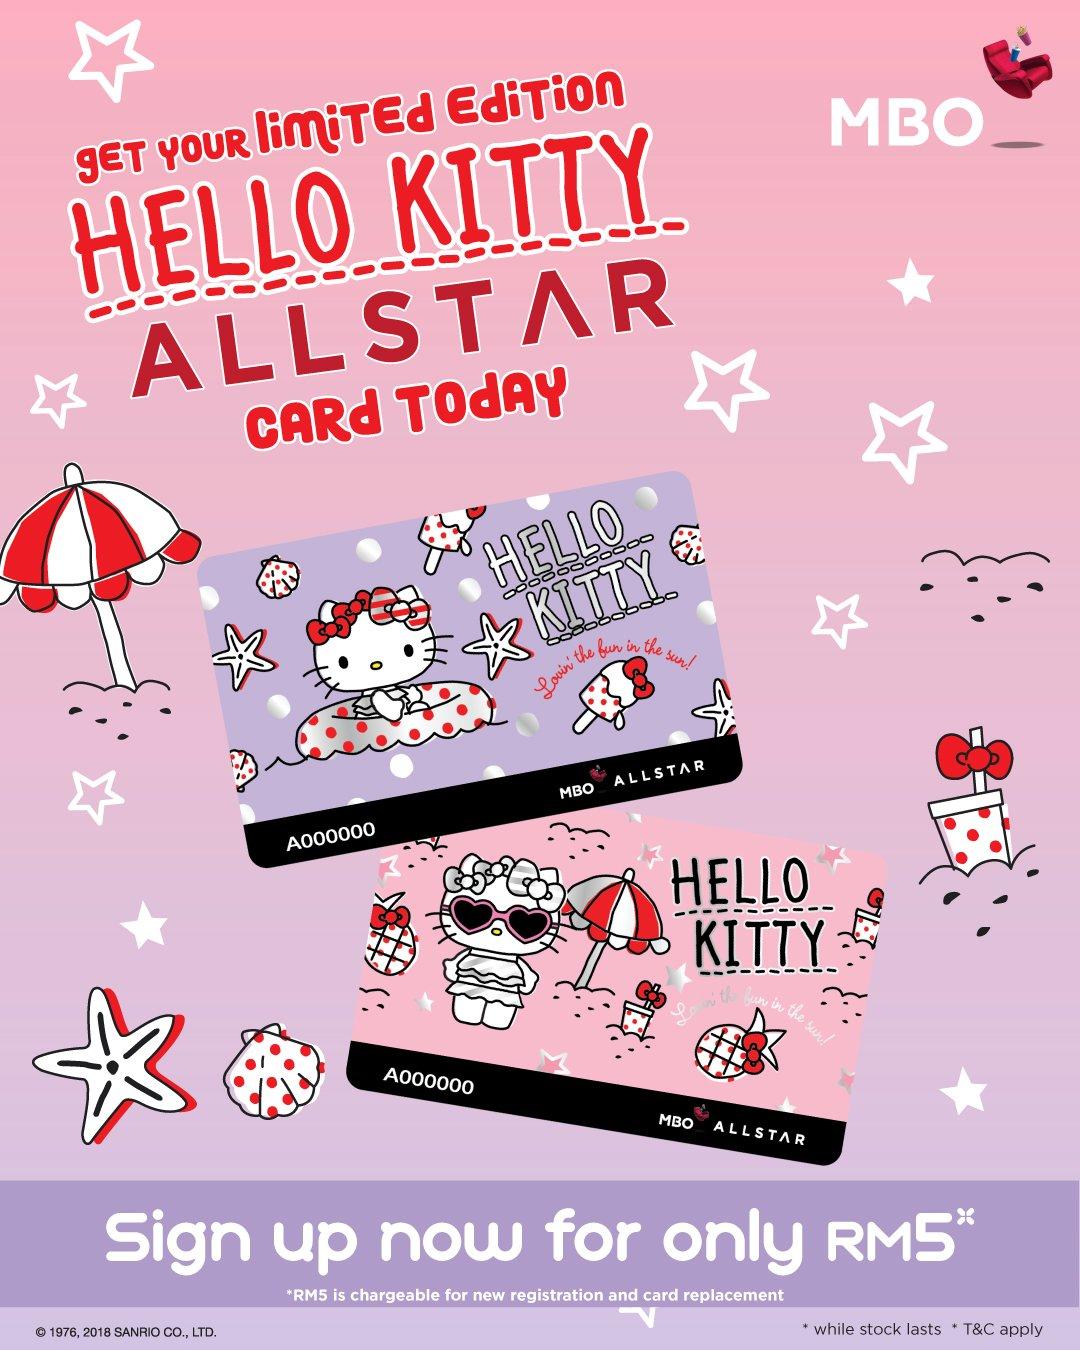 Mbo Cinemas On Twitter Limited Edition Hello Kitty Allstar Card